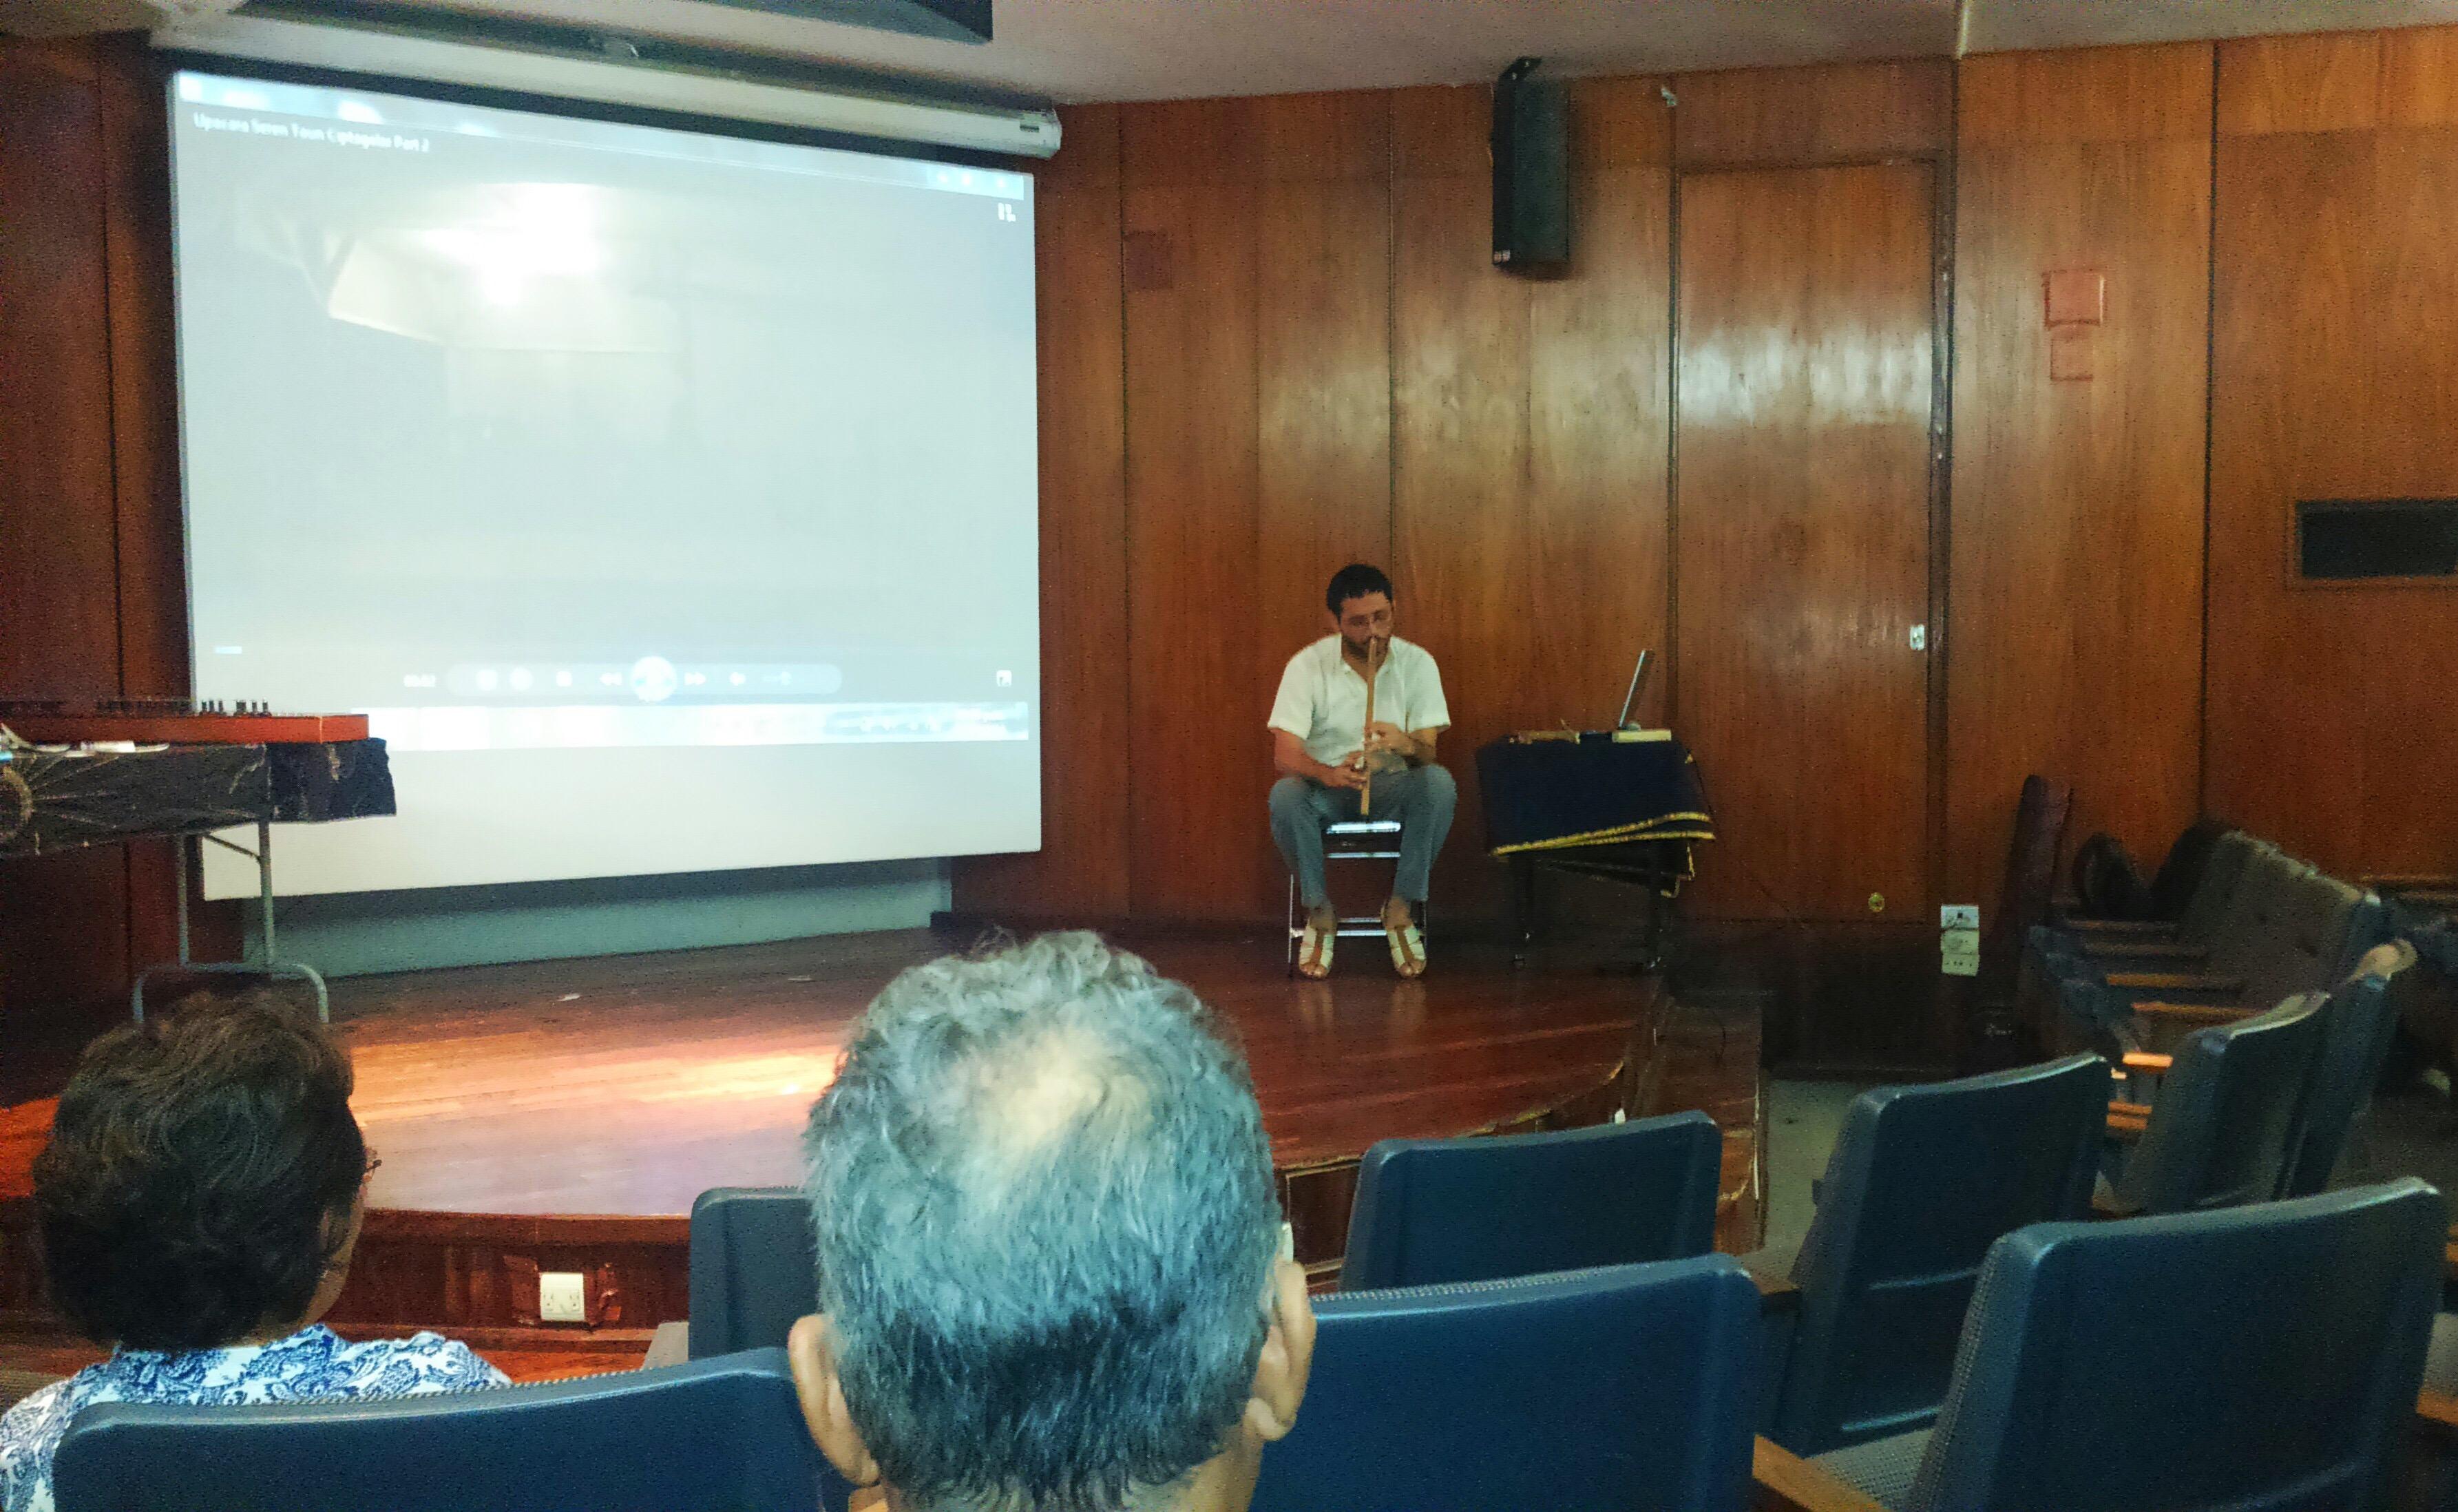 Imparten charla sobre música sundanesa